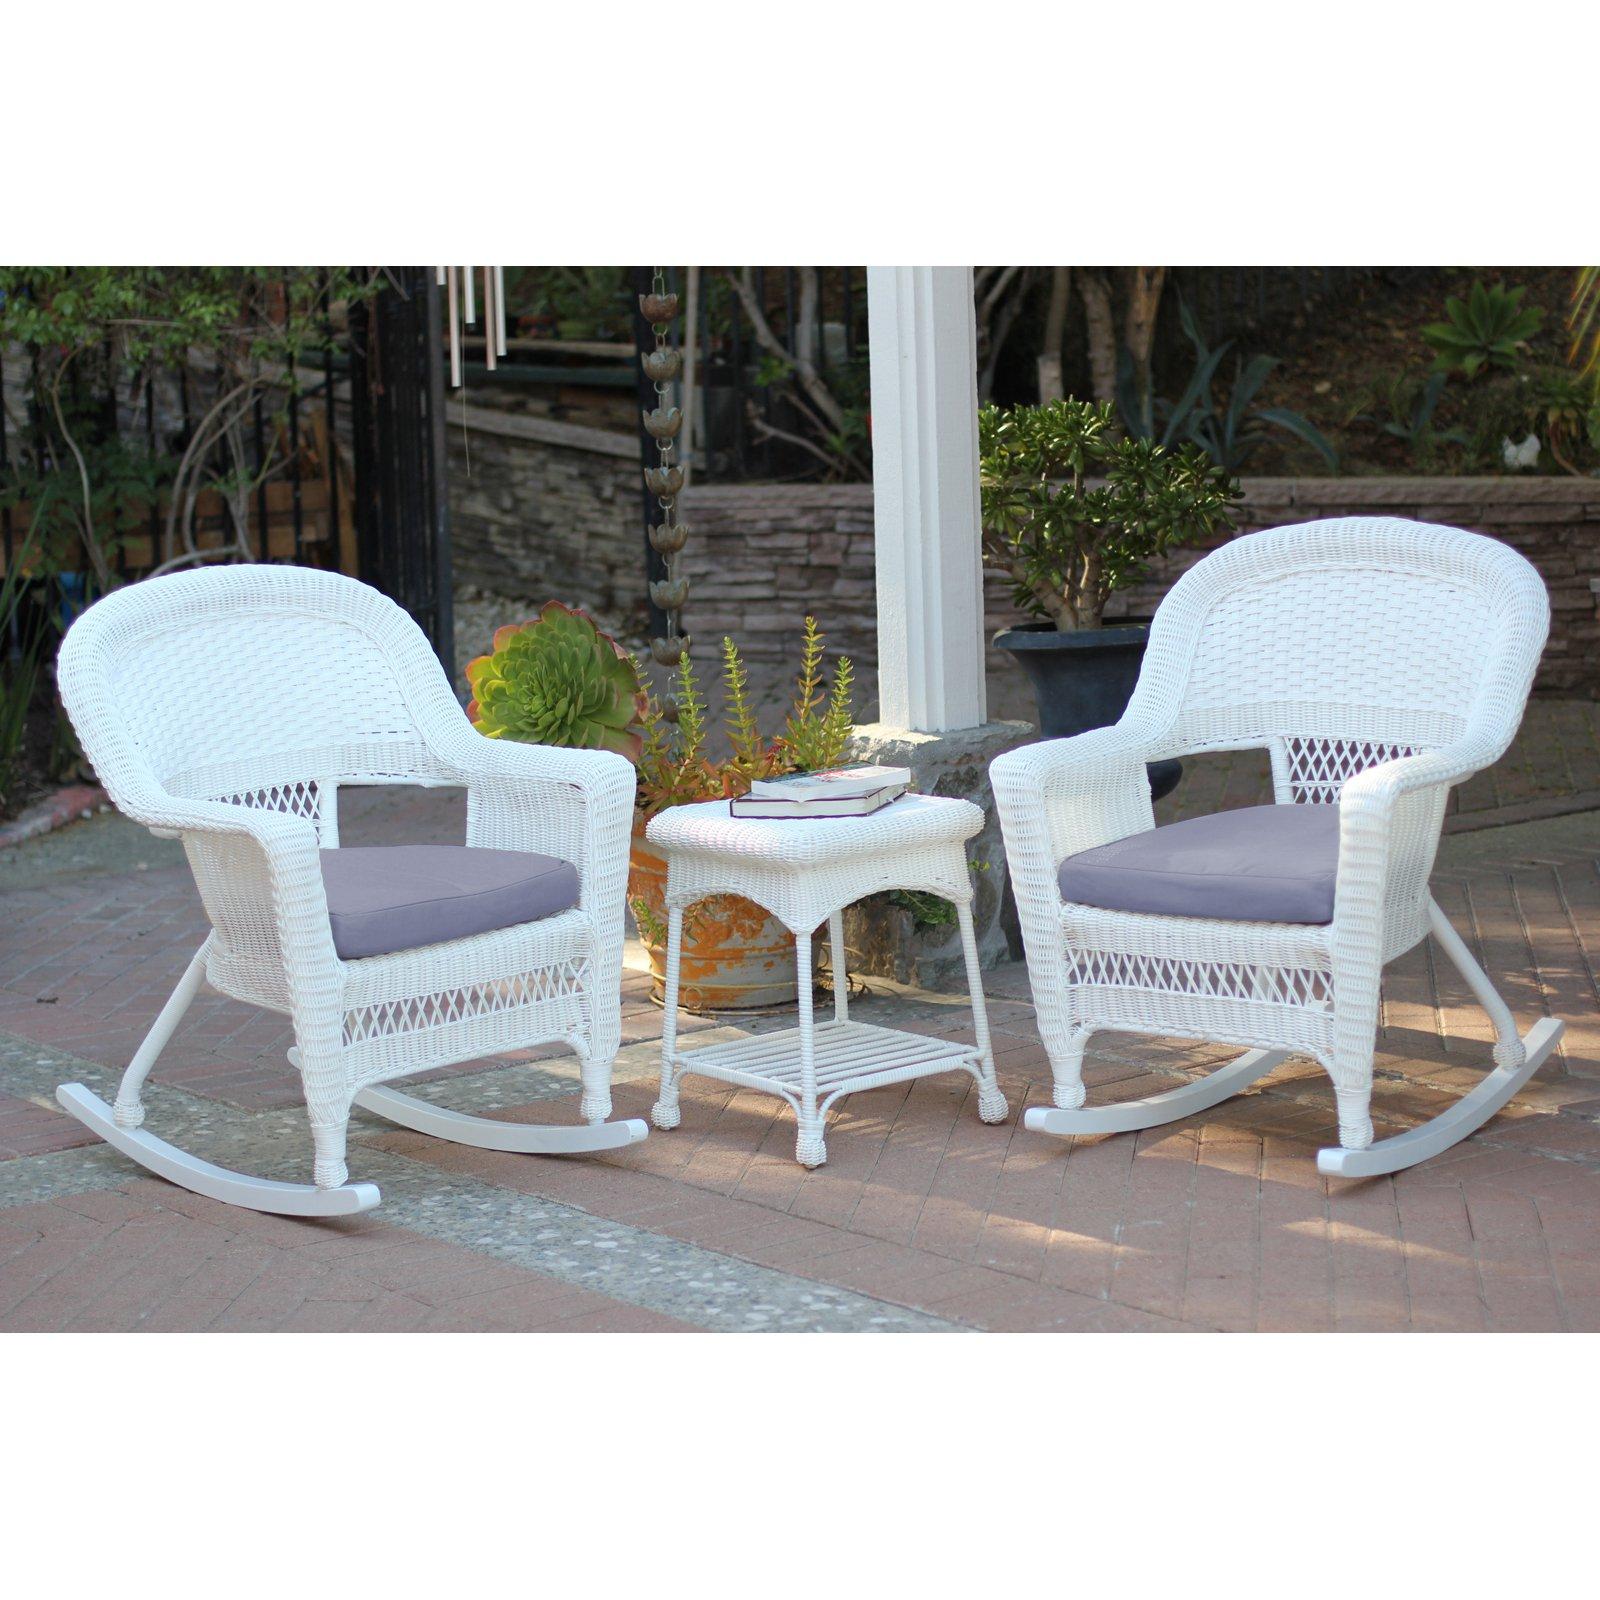 Outdoor Jeco 3 Pc Wicker Rocker Chair Set With Side Table Purple In